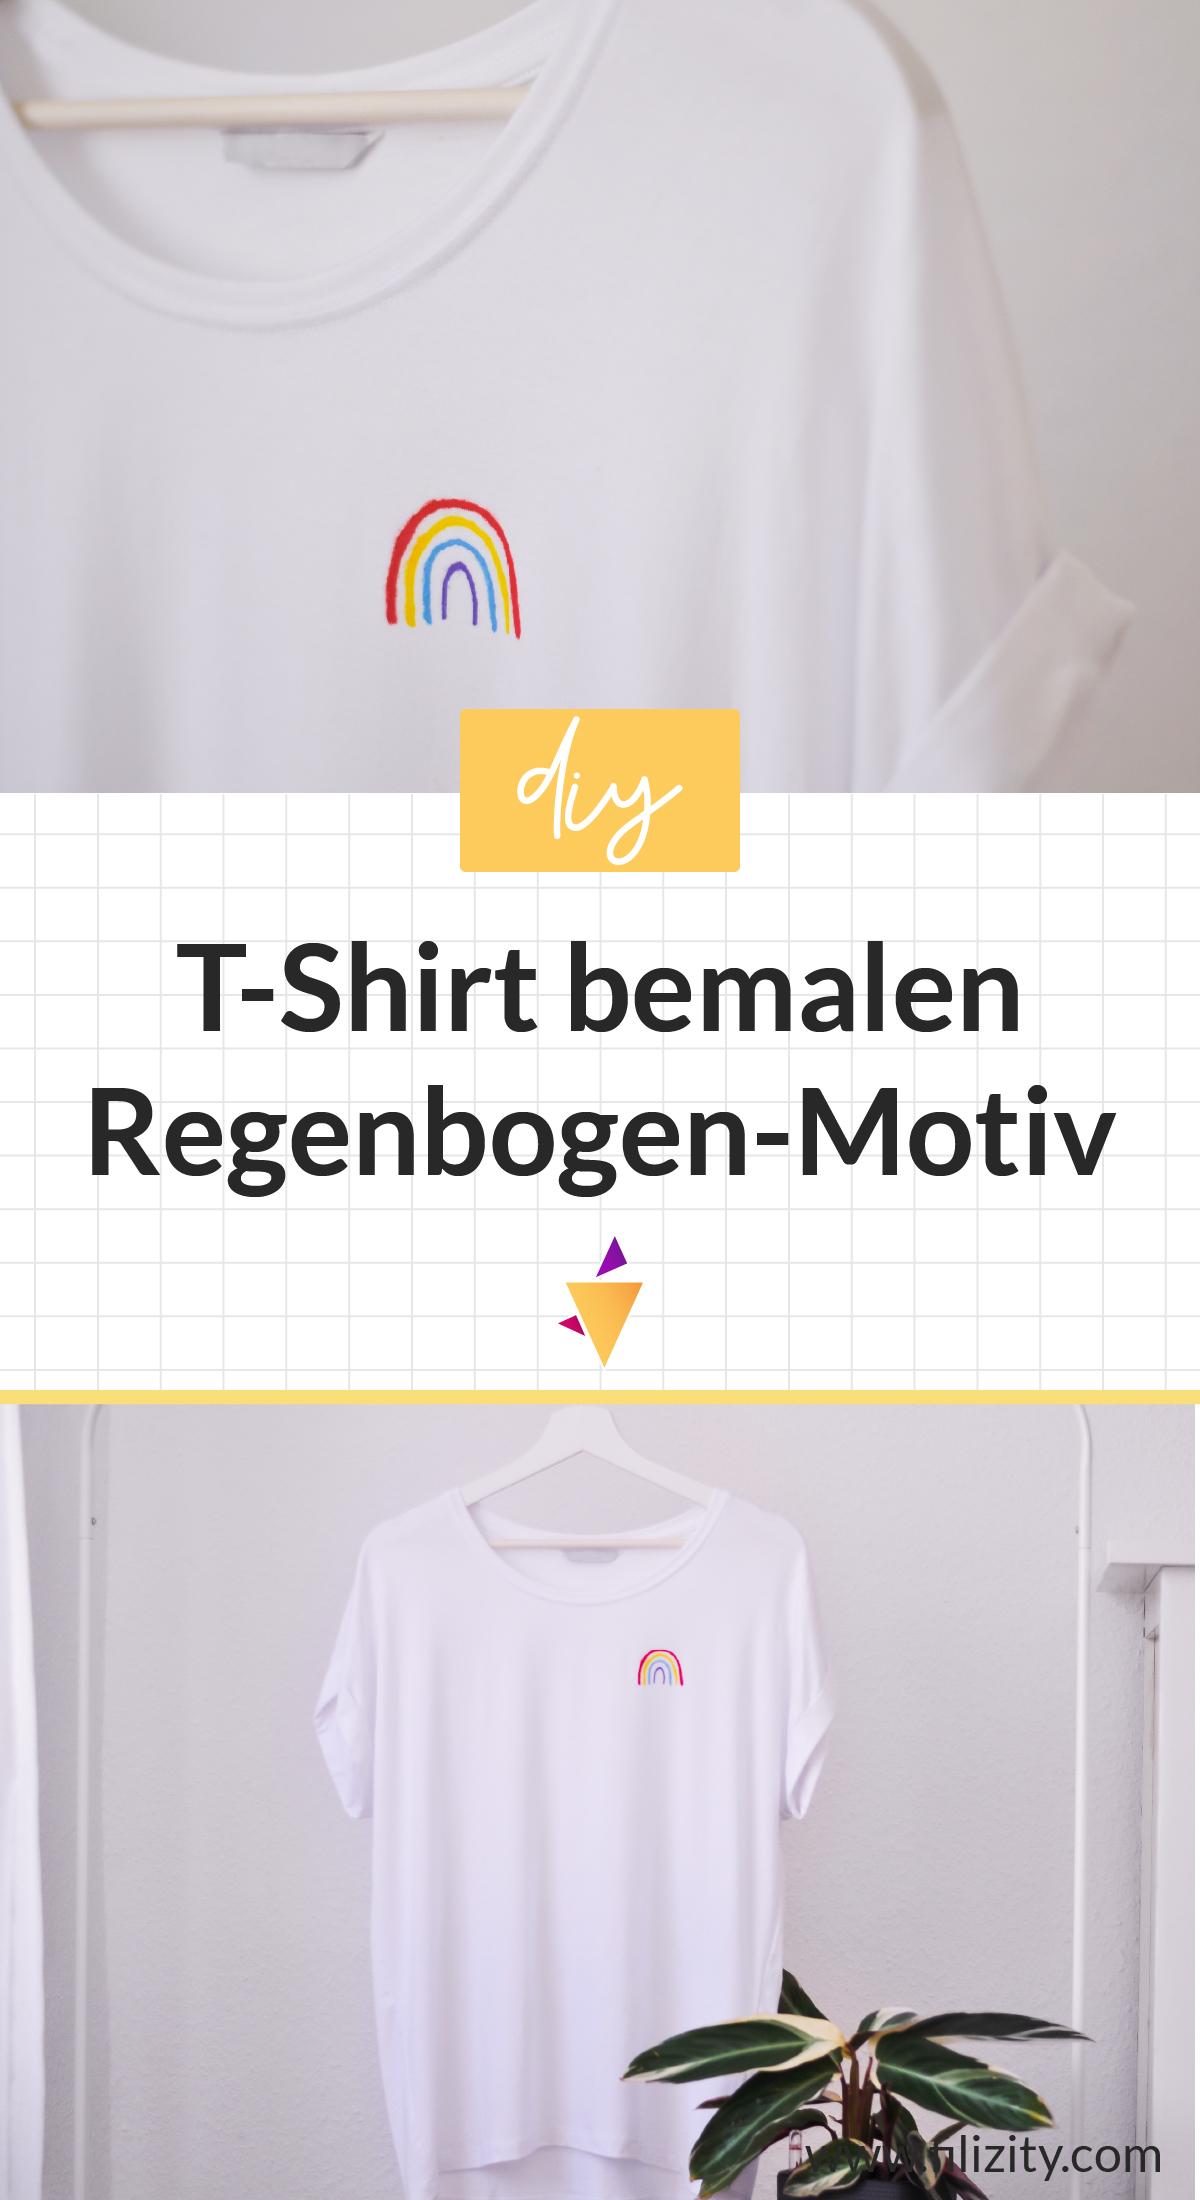 DIY Regenbogen: T-Shirt bemalen, Hoffnung schenken | Filizity.com - Kreativmagazin & DIY Blog #corona #regenbogen #wirbleibenzuhause #upcycling